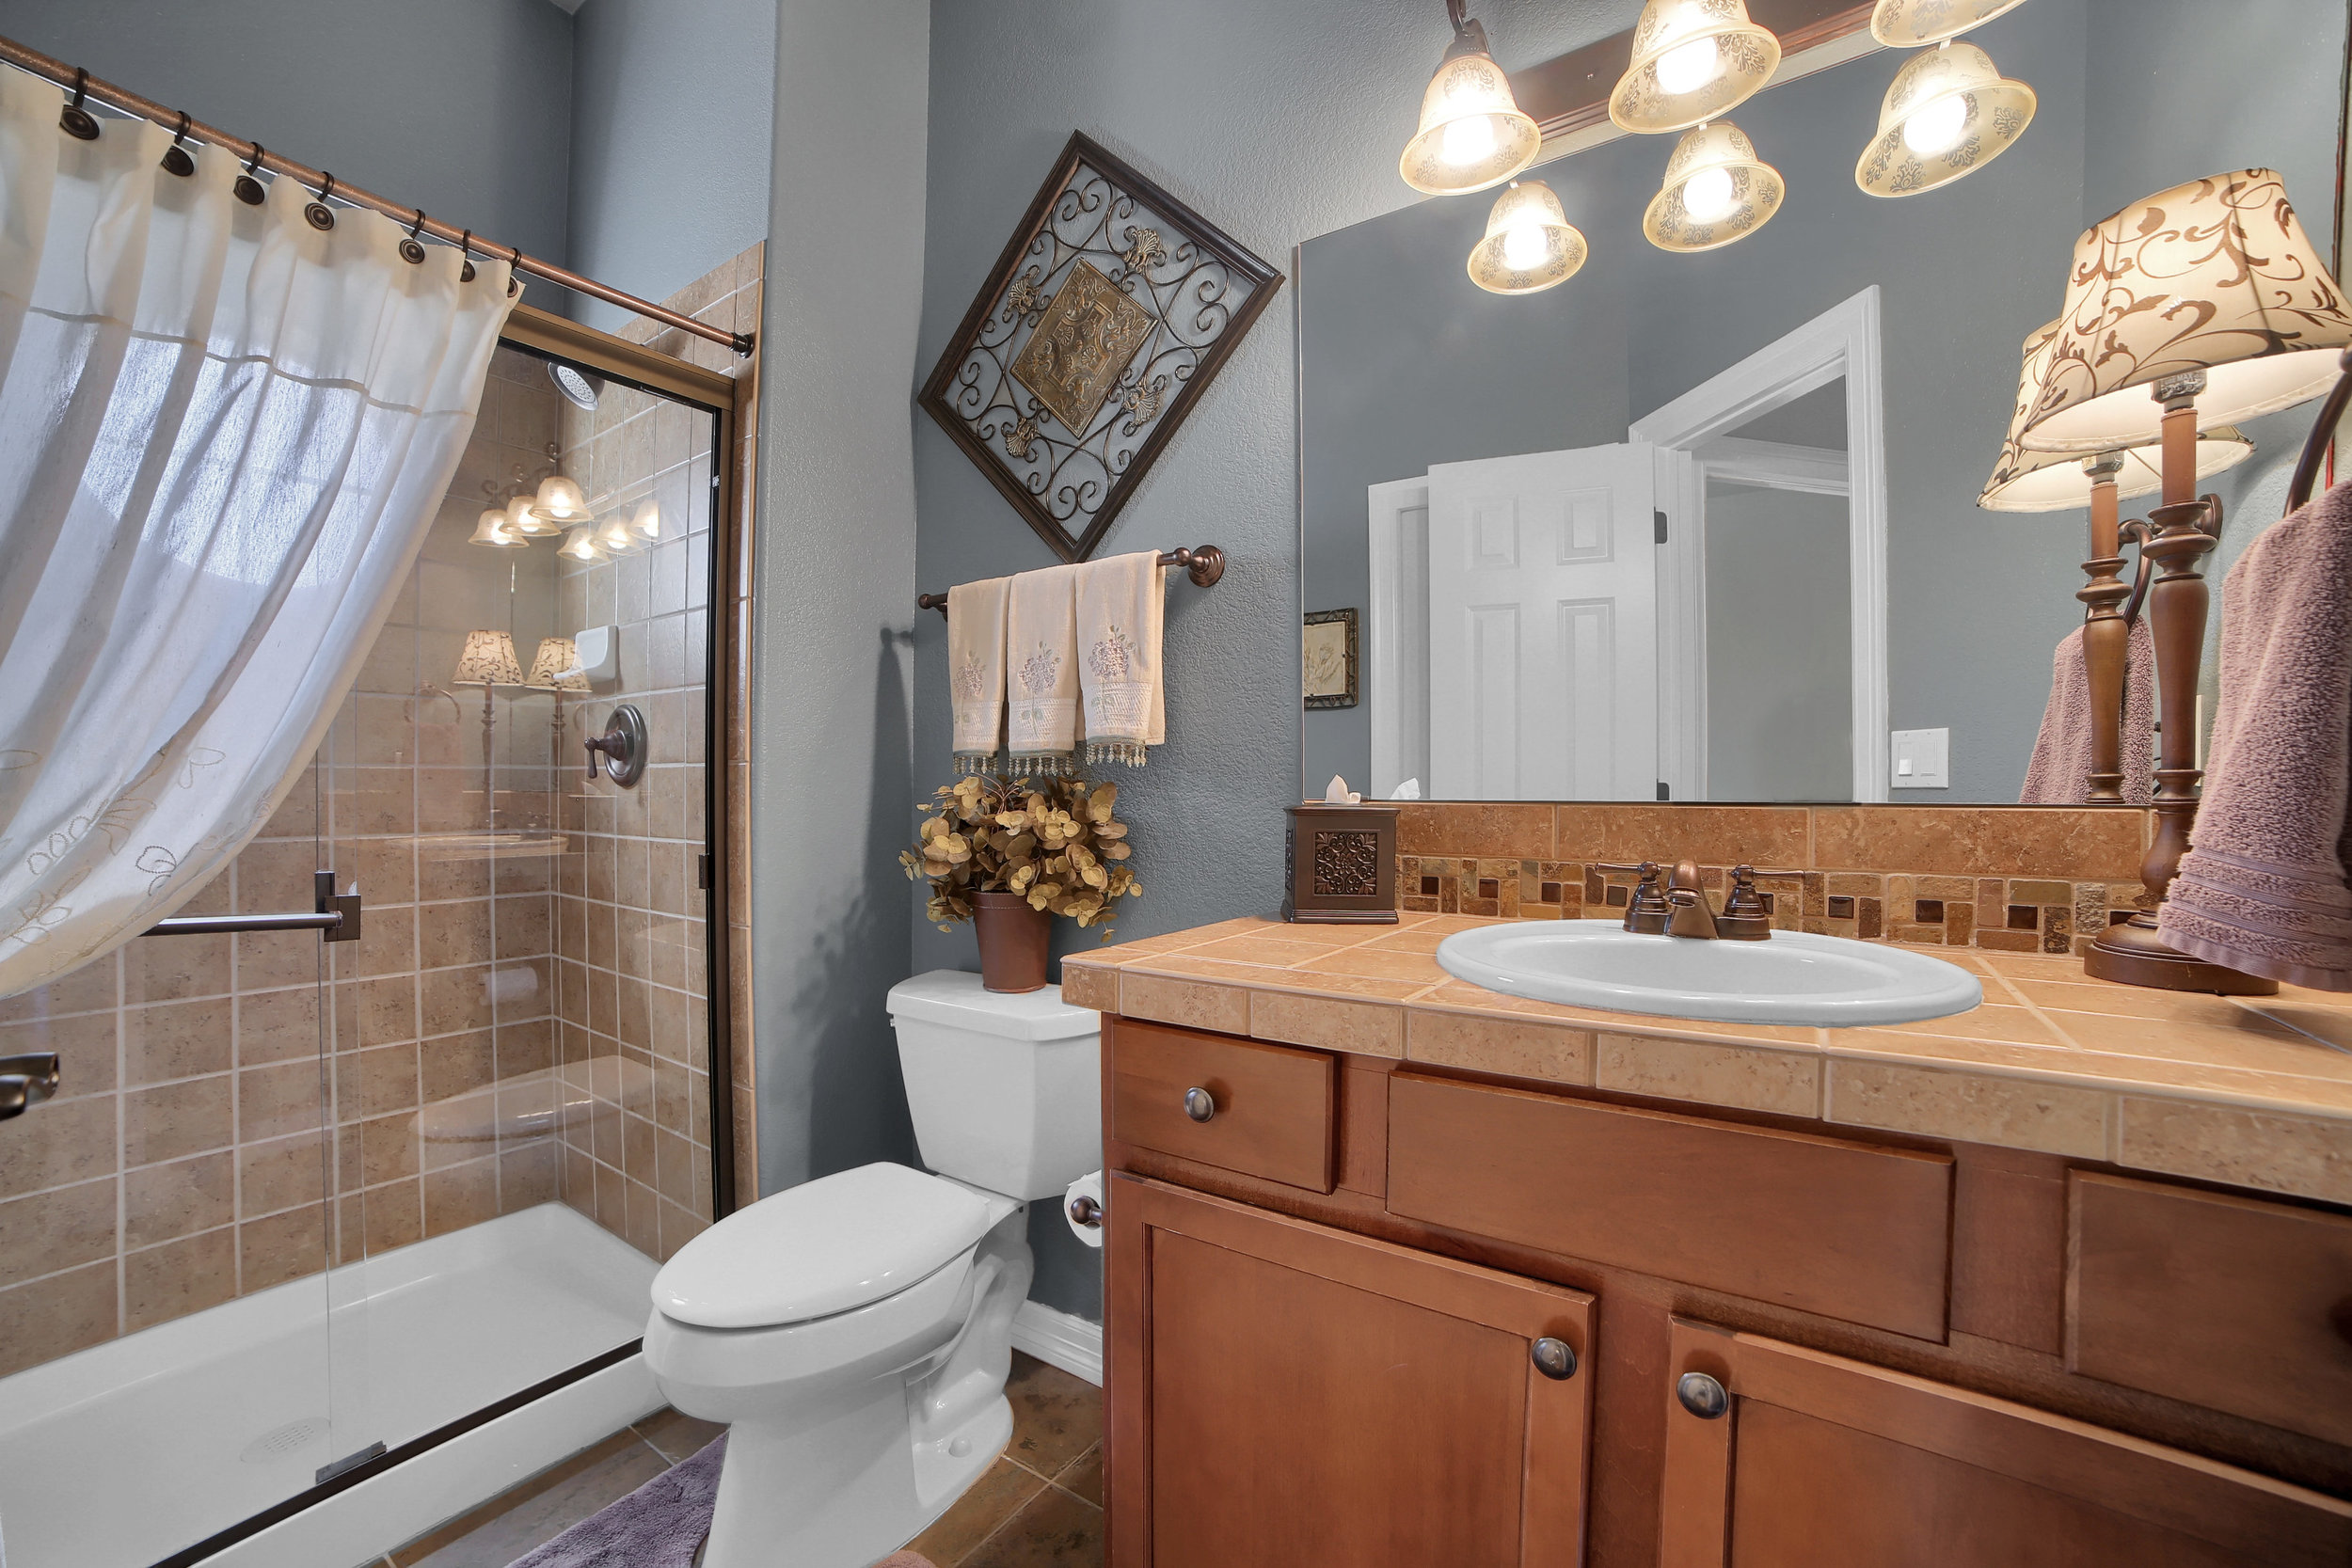 12496 Creekhurst Dr Colorado-print-053-034-Bathroom-3648x2432-300dpi.jpg